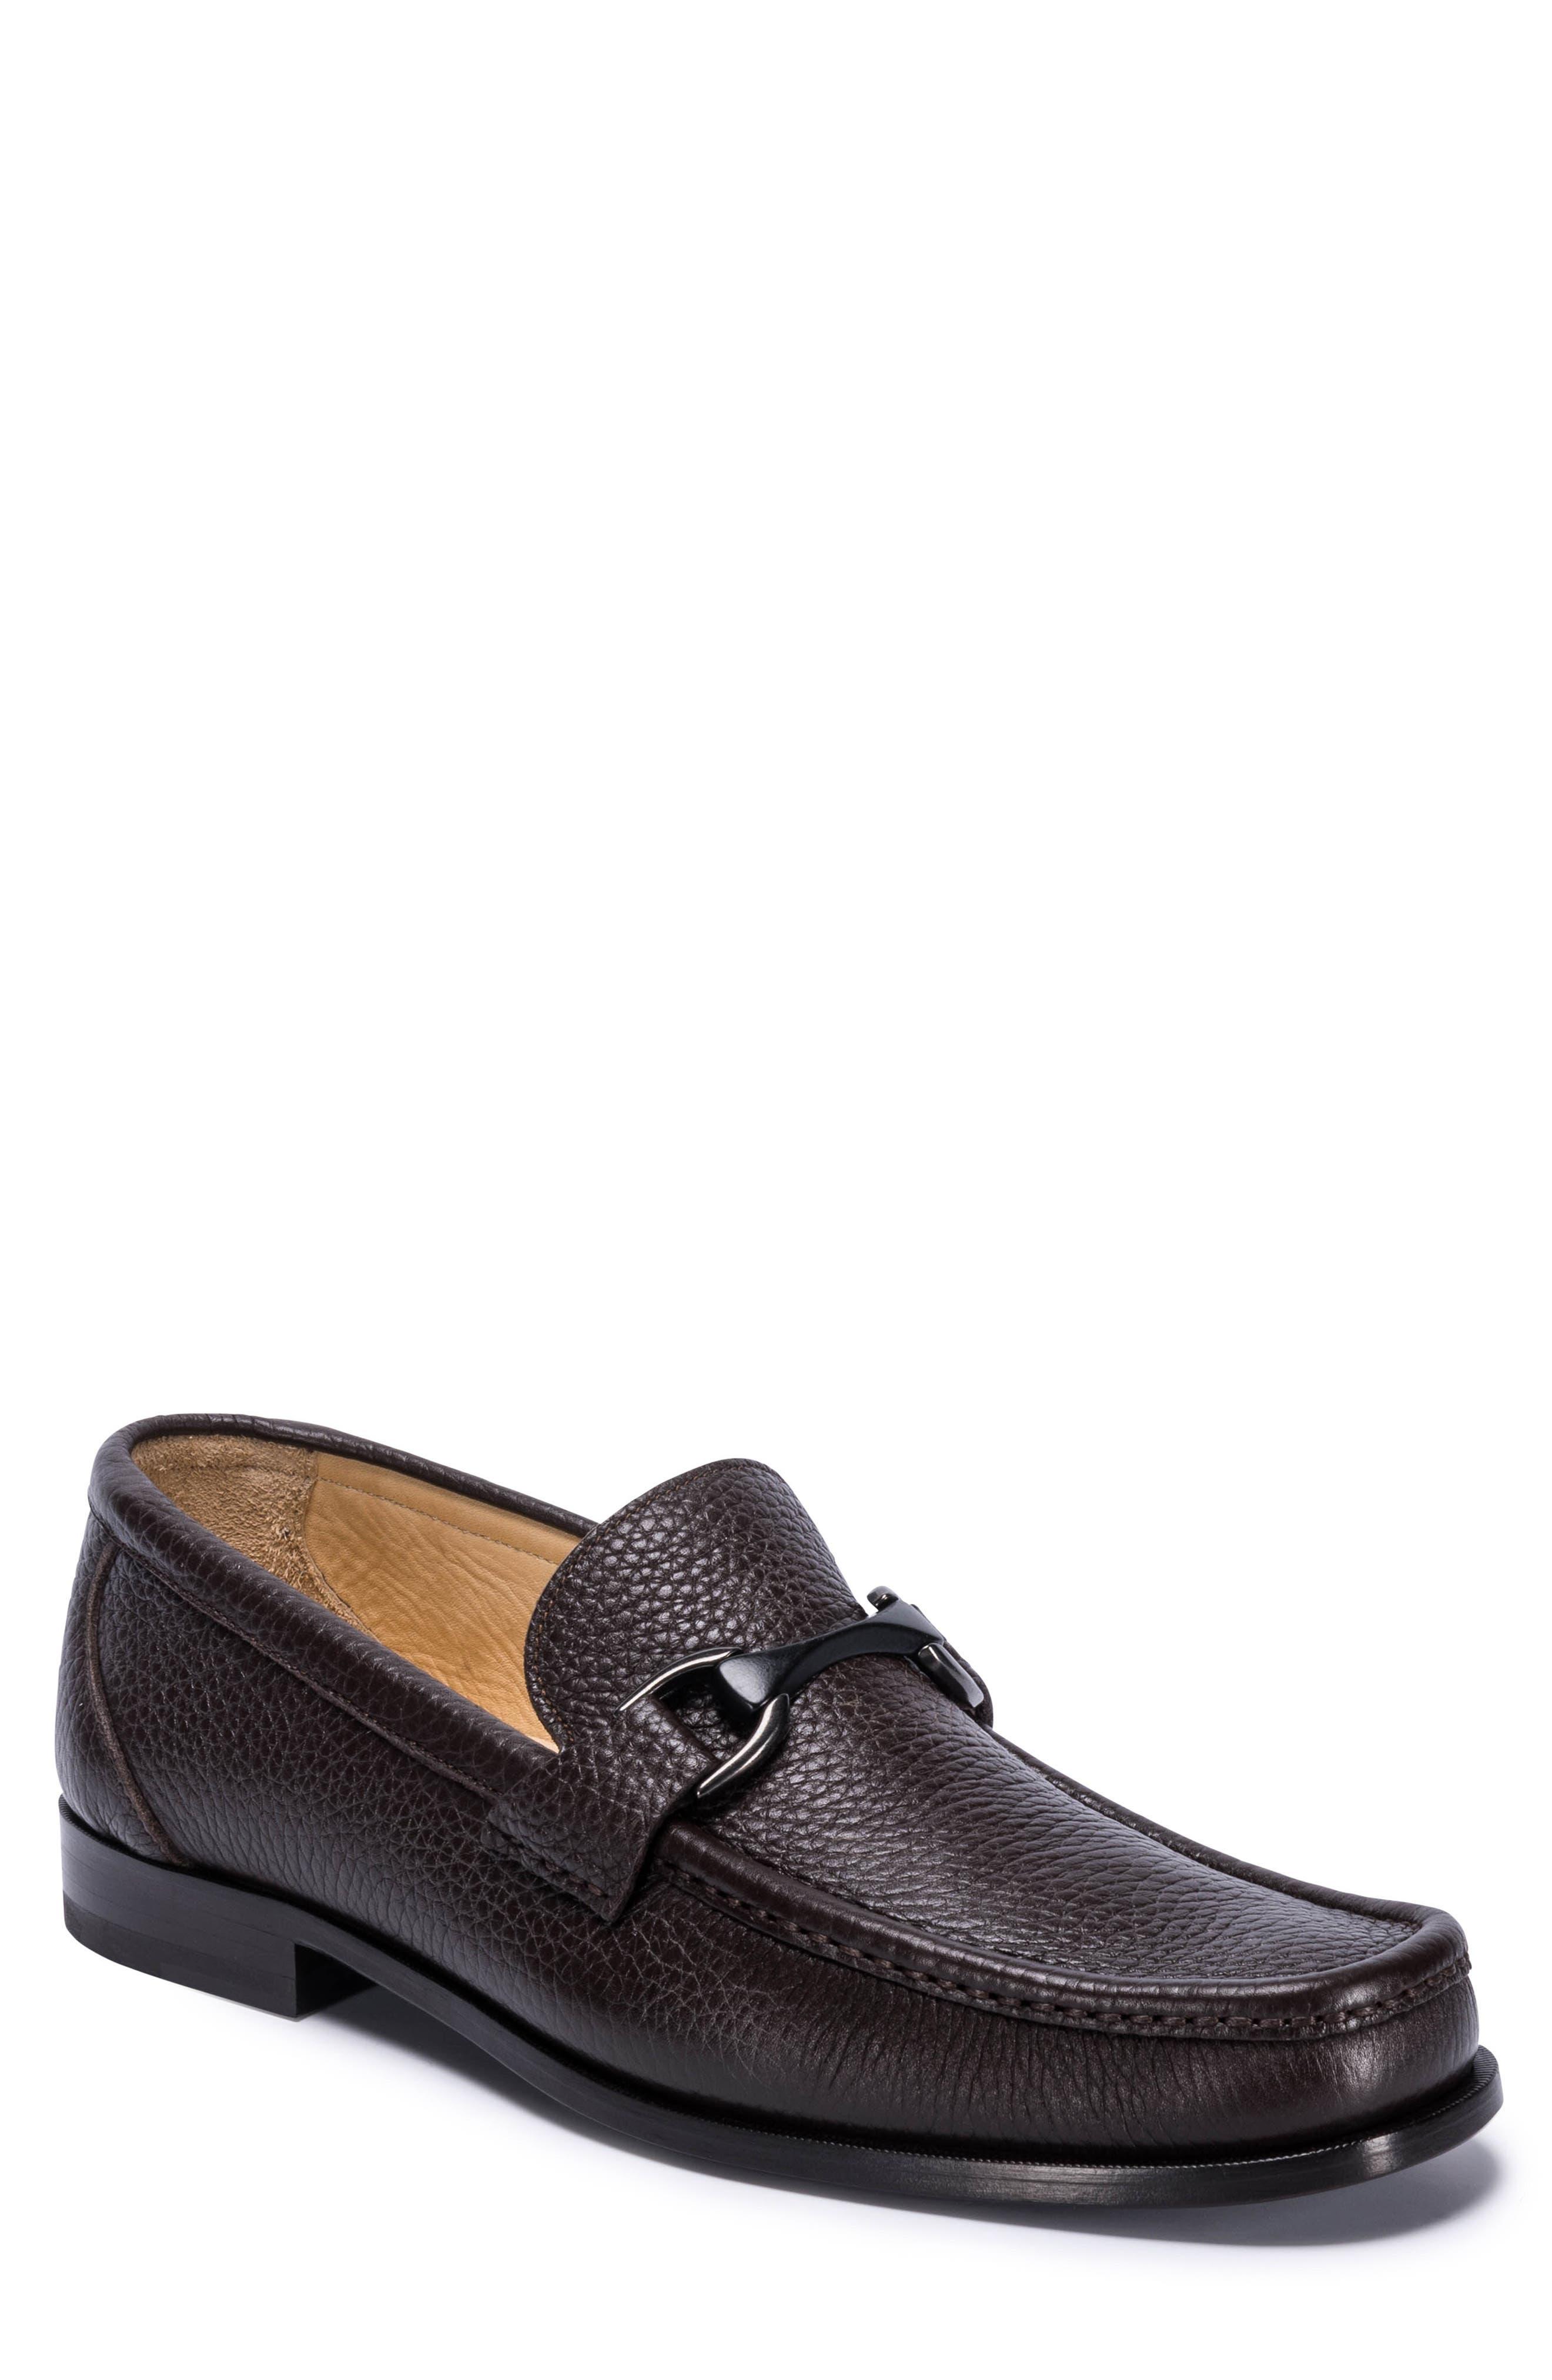 Padua Bit Loafer,                         Main,                         color, Brown Leather